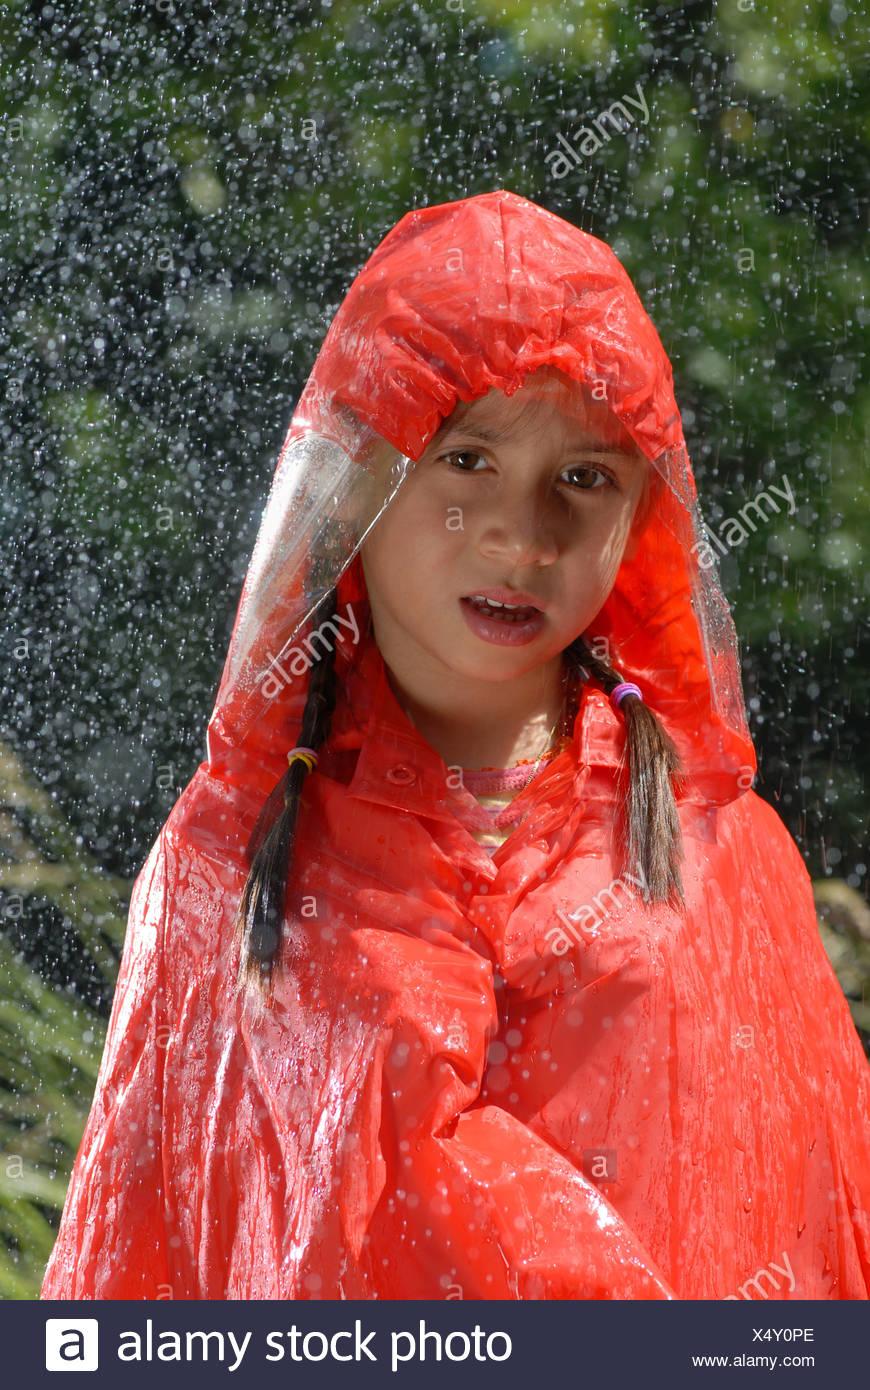 Rains, wetness, water, Autumn, fall, child, girl, orange, weather, rain protection - Stock Image